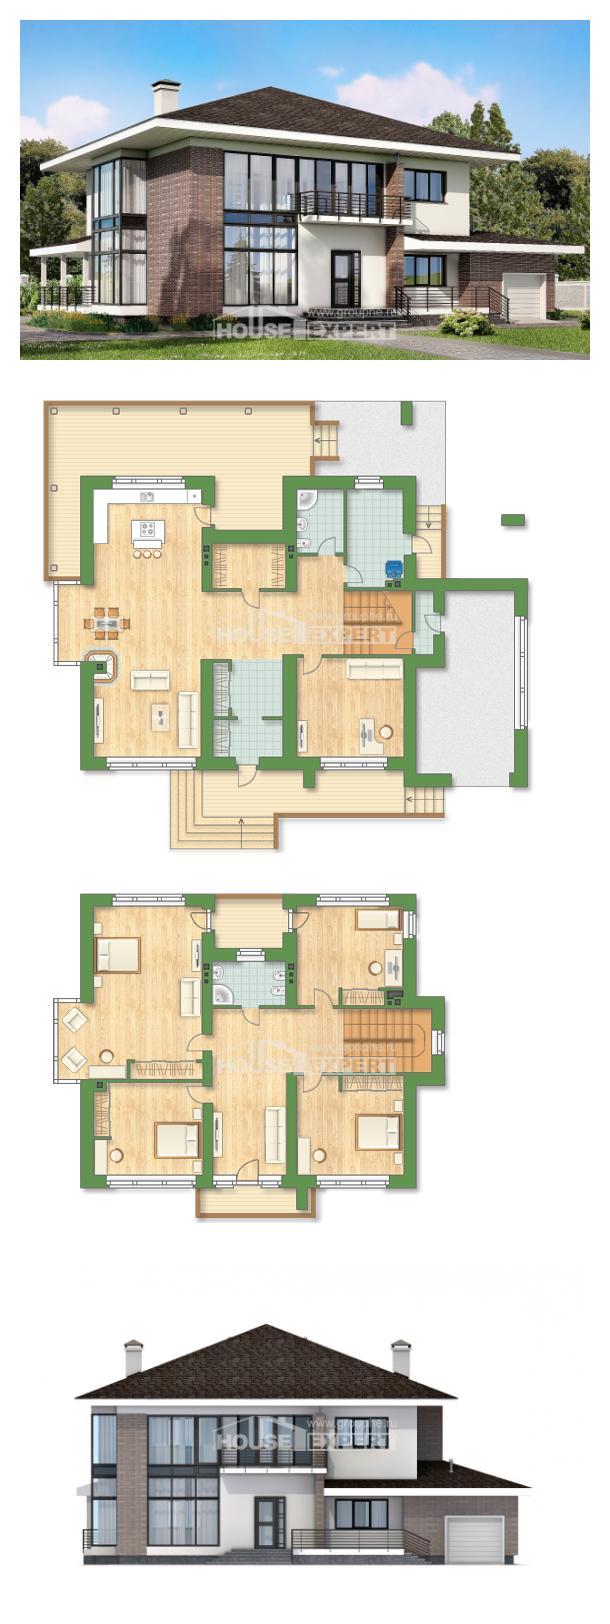 Projekt domu 275-002-R | House Expert